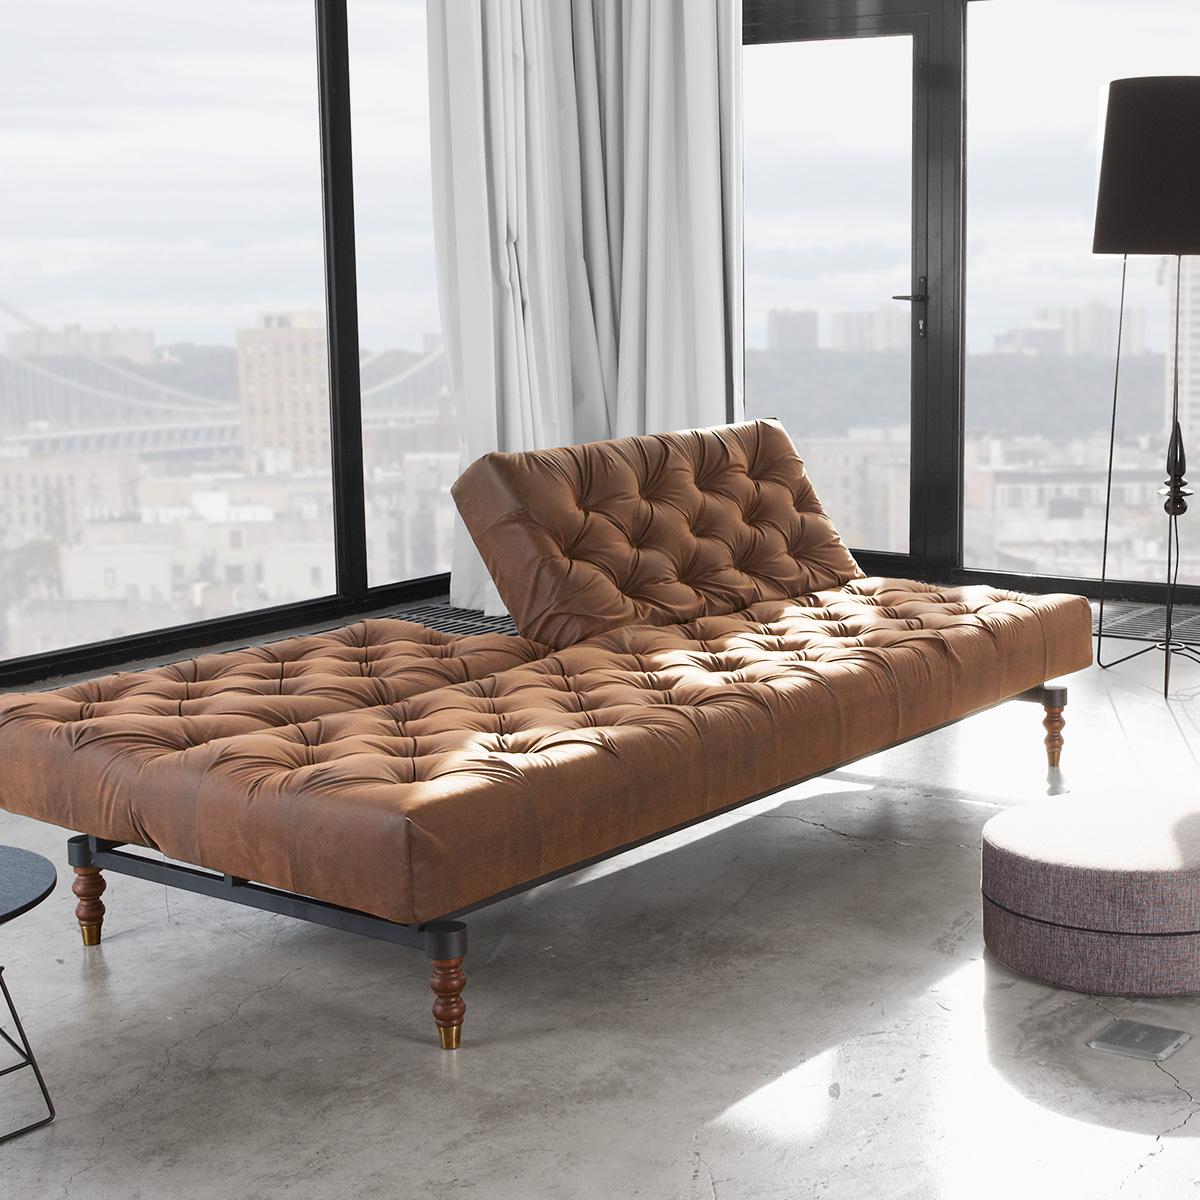 innovation oldschool schlafsofa 94 741018461 4 11. Black Bedroom Furniture Sets. Home Design Ideas